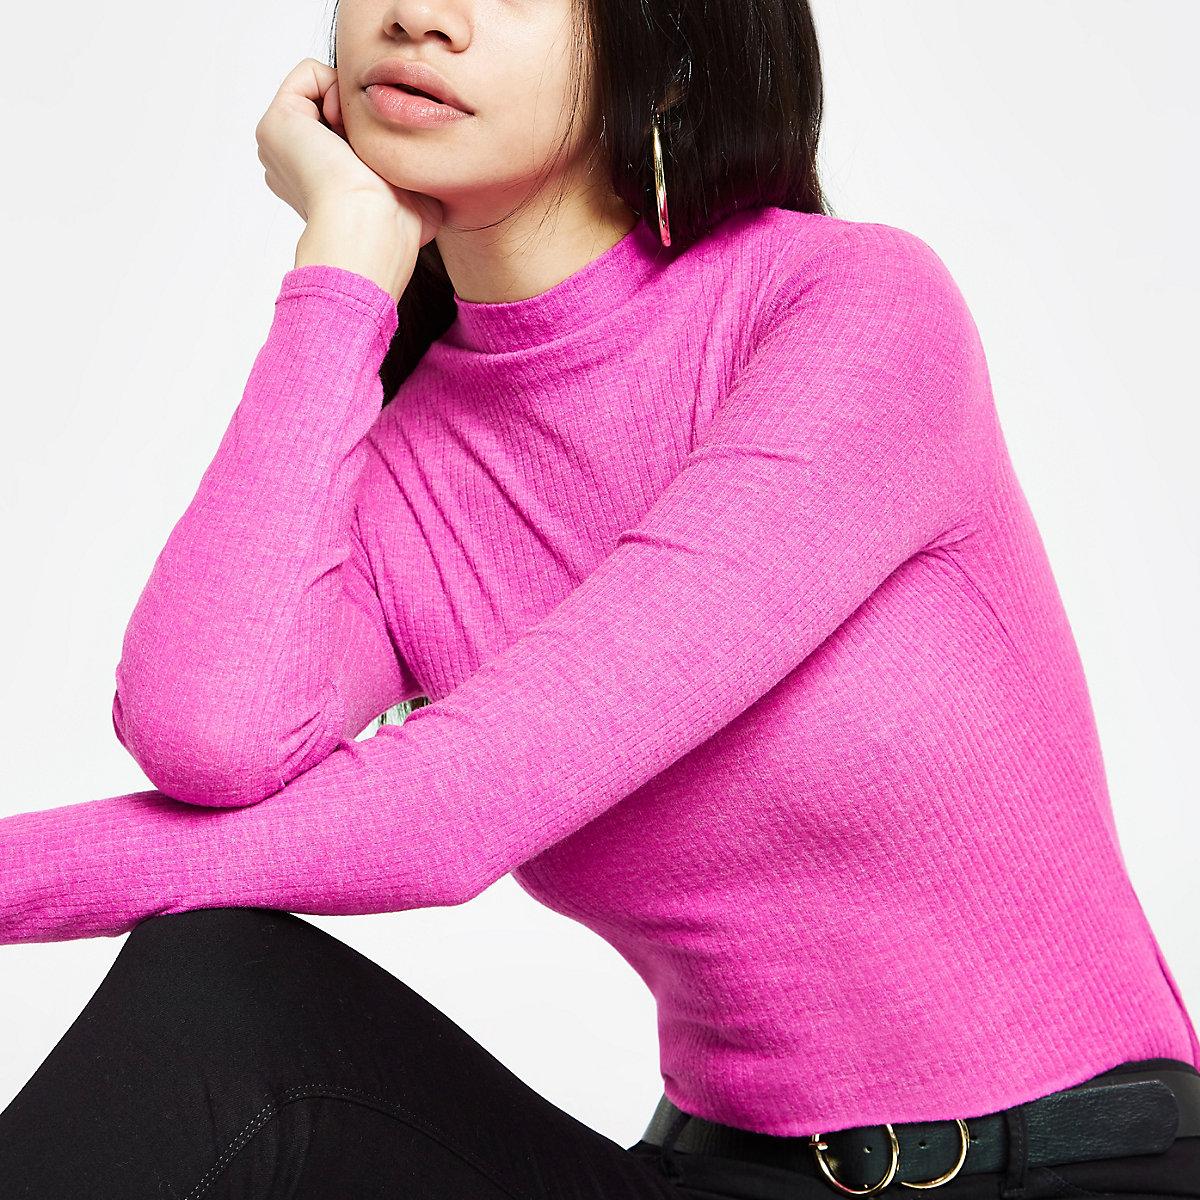 Pink brushed rib high neck top